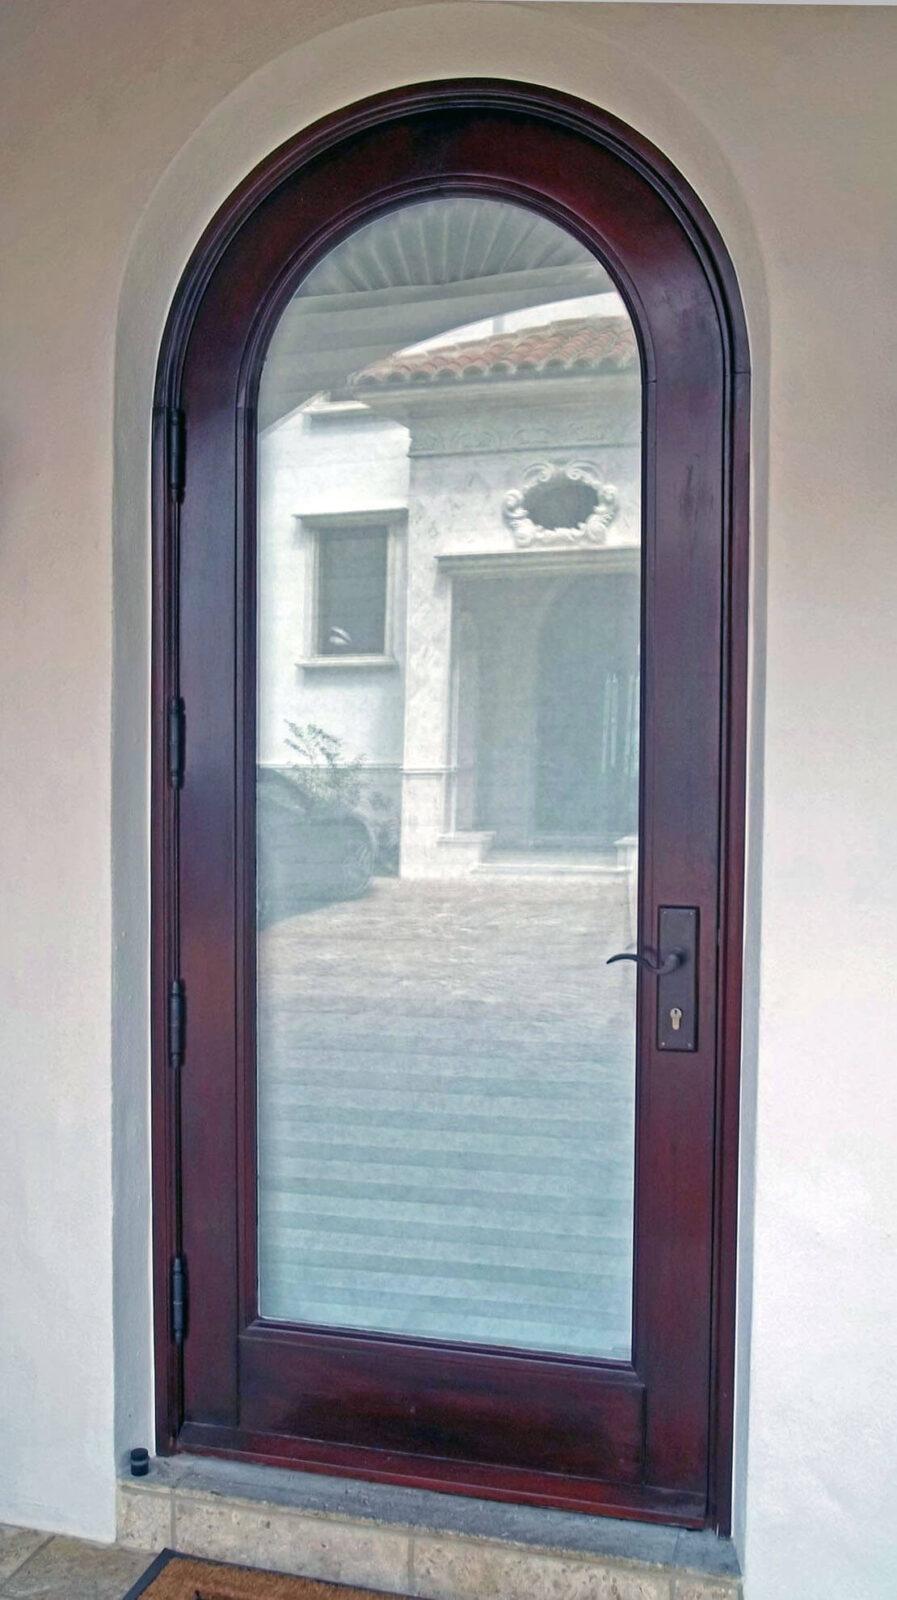 BISCAYNE POINT. MAHOGANY GLASS DOOR.